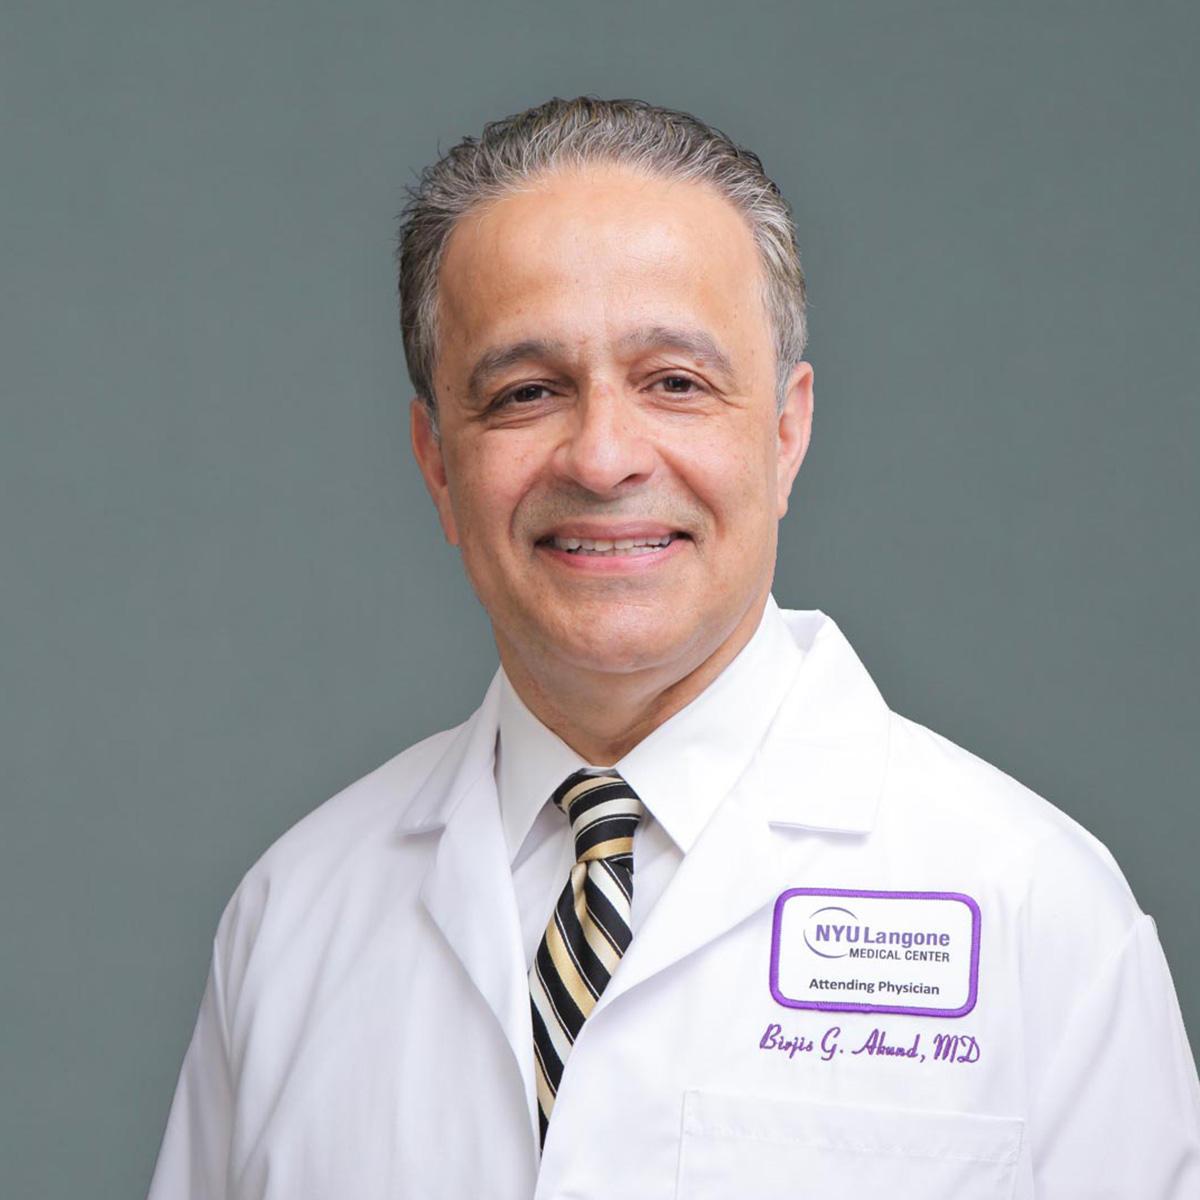 Birjis George Akhund, MD